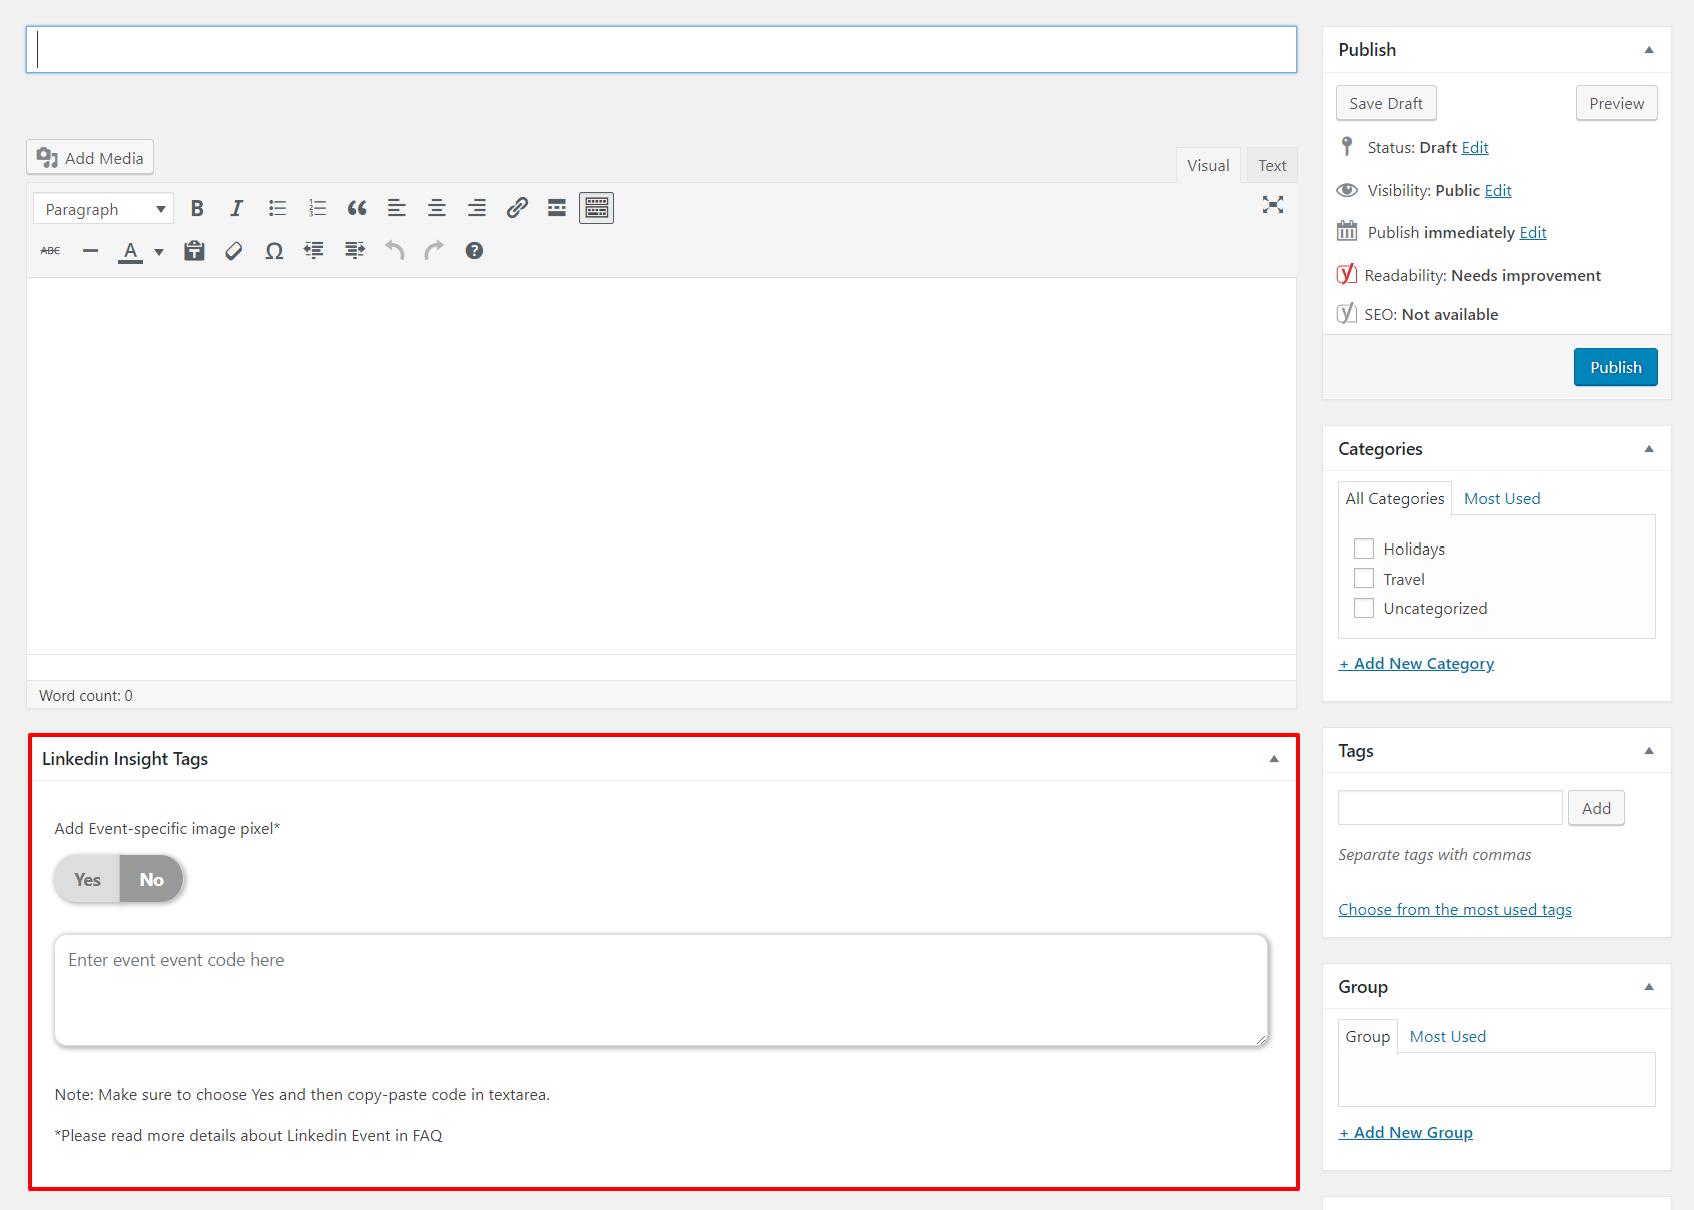 Lktags - Linkedin Insight Tags Settings Page